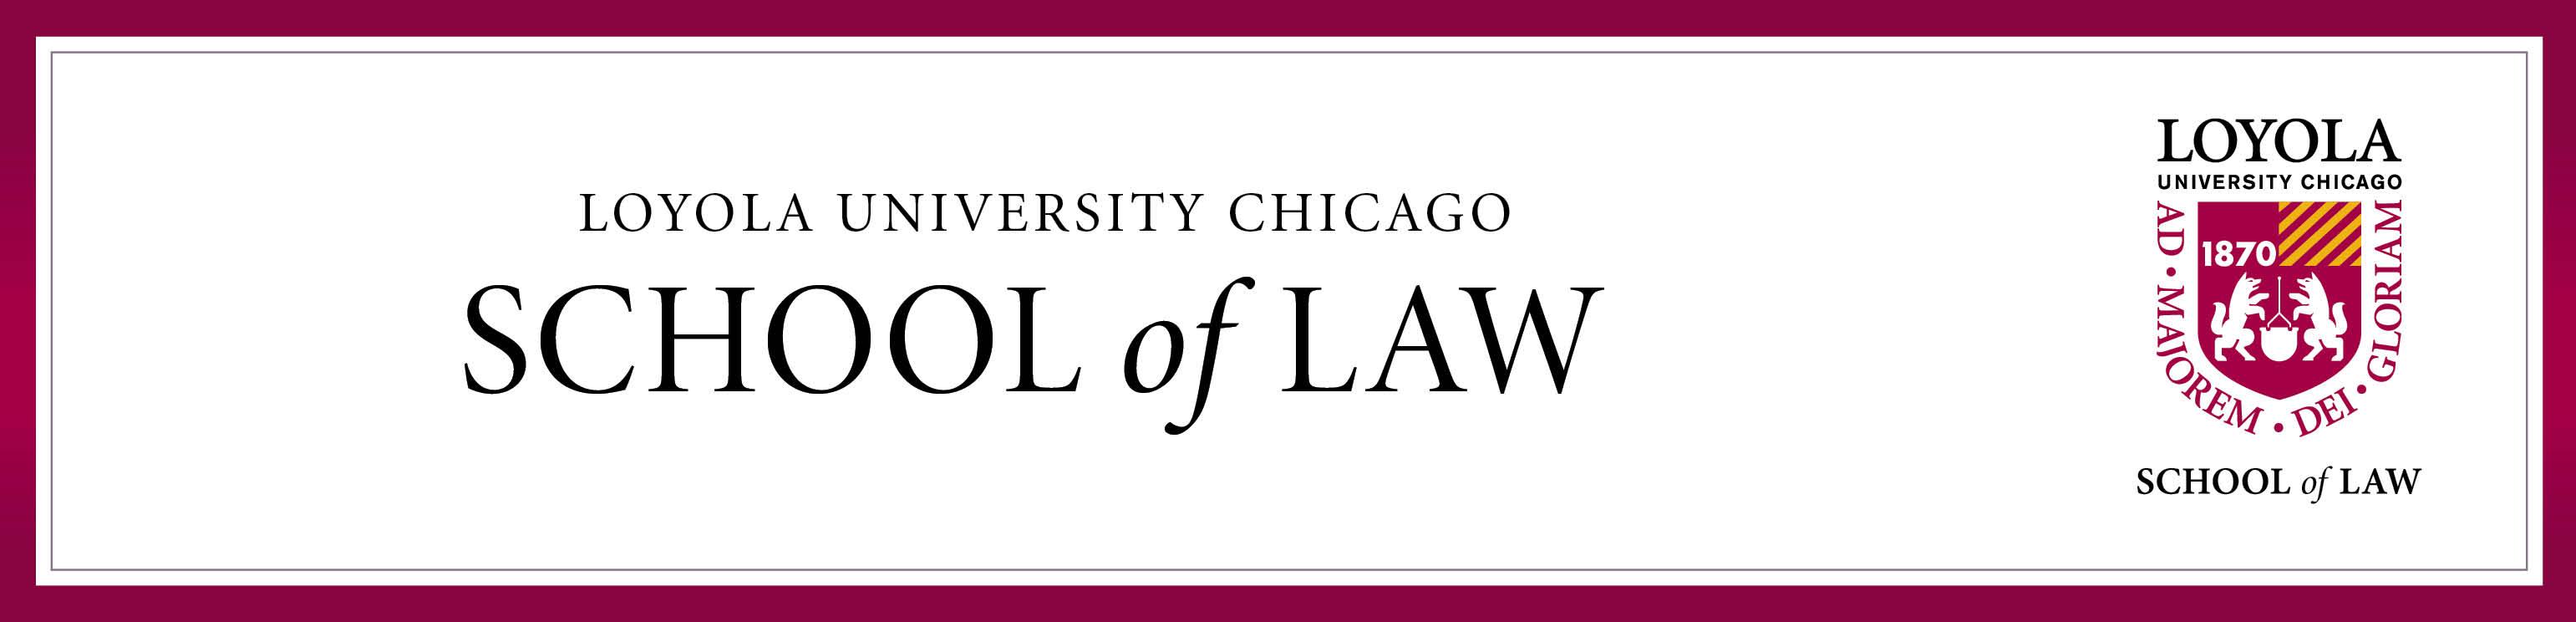 Generic Law School Header